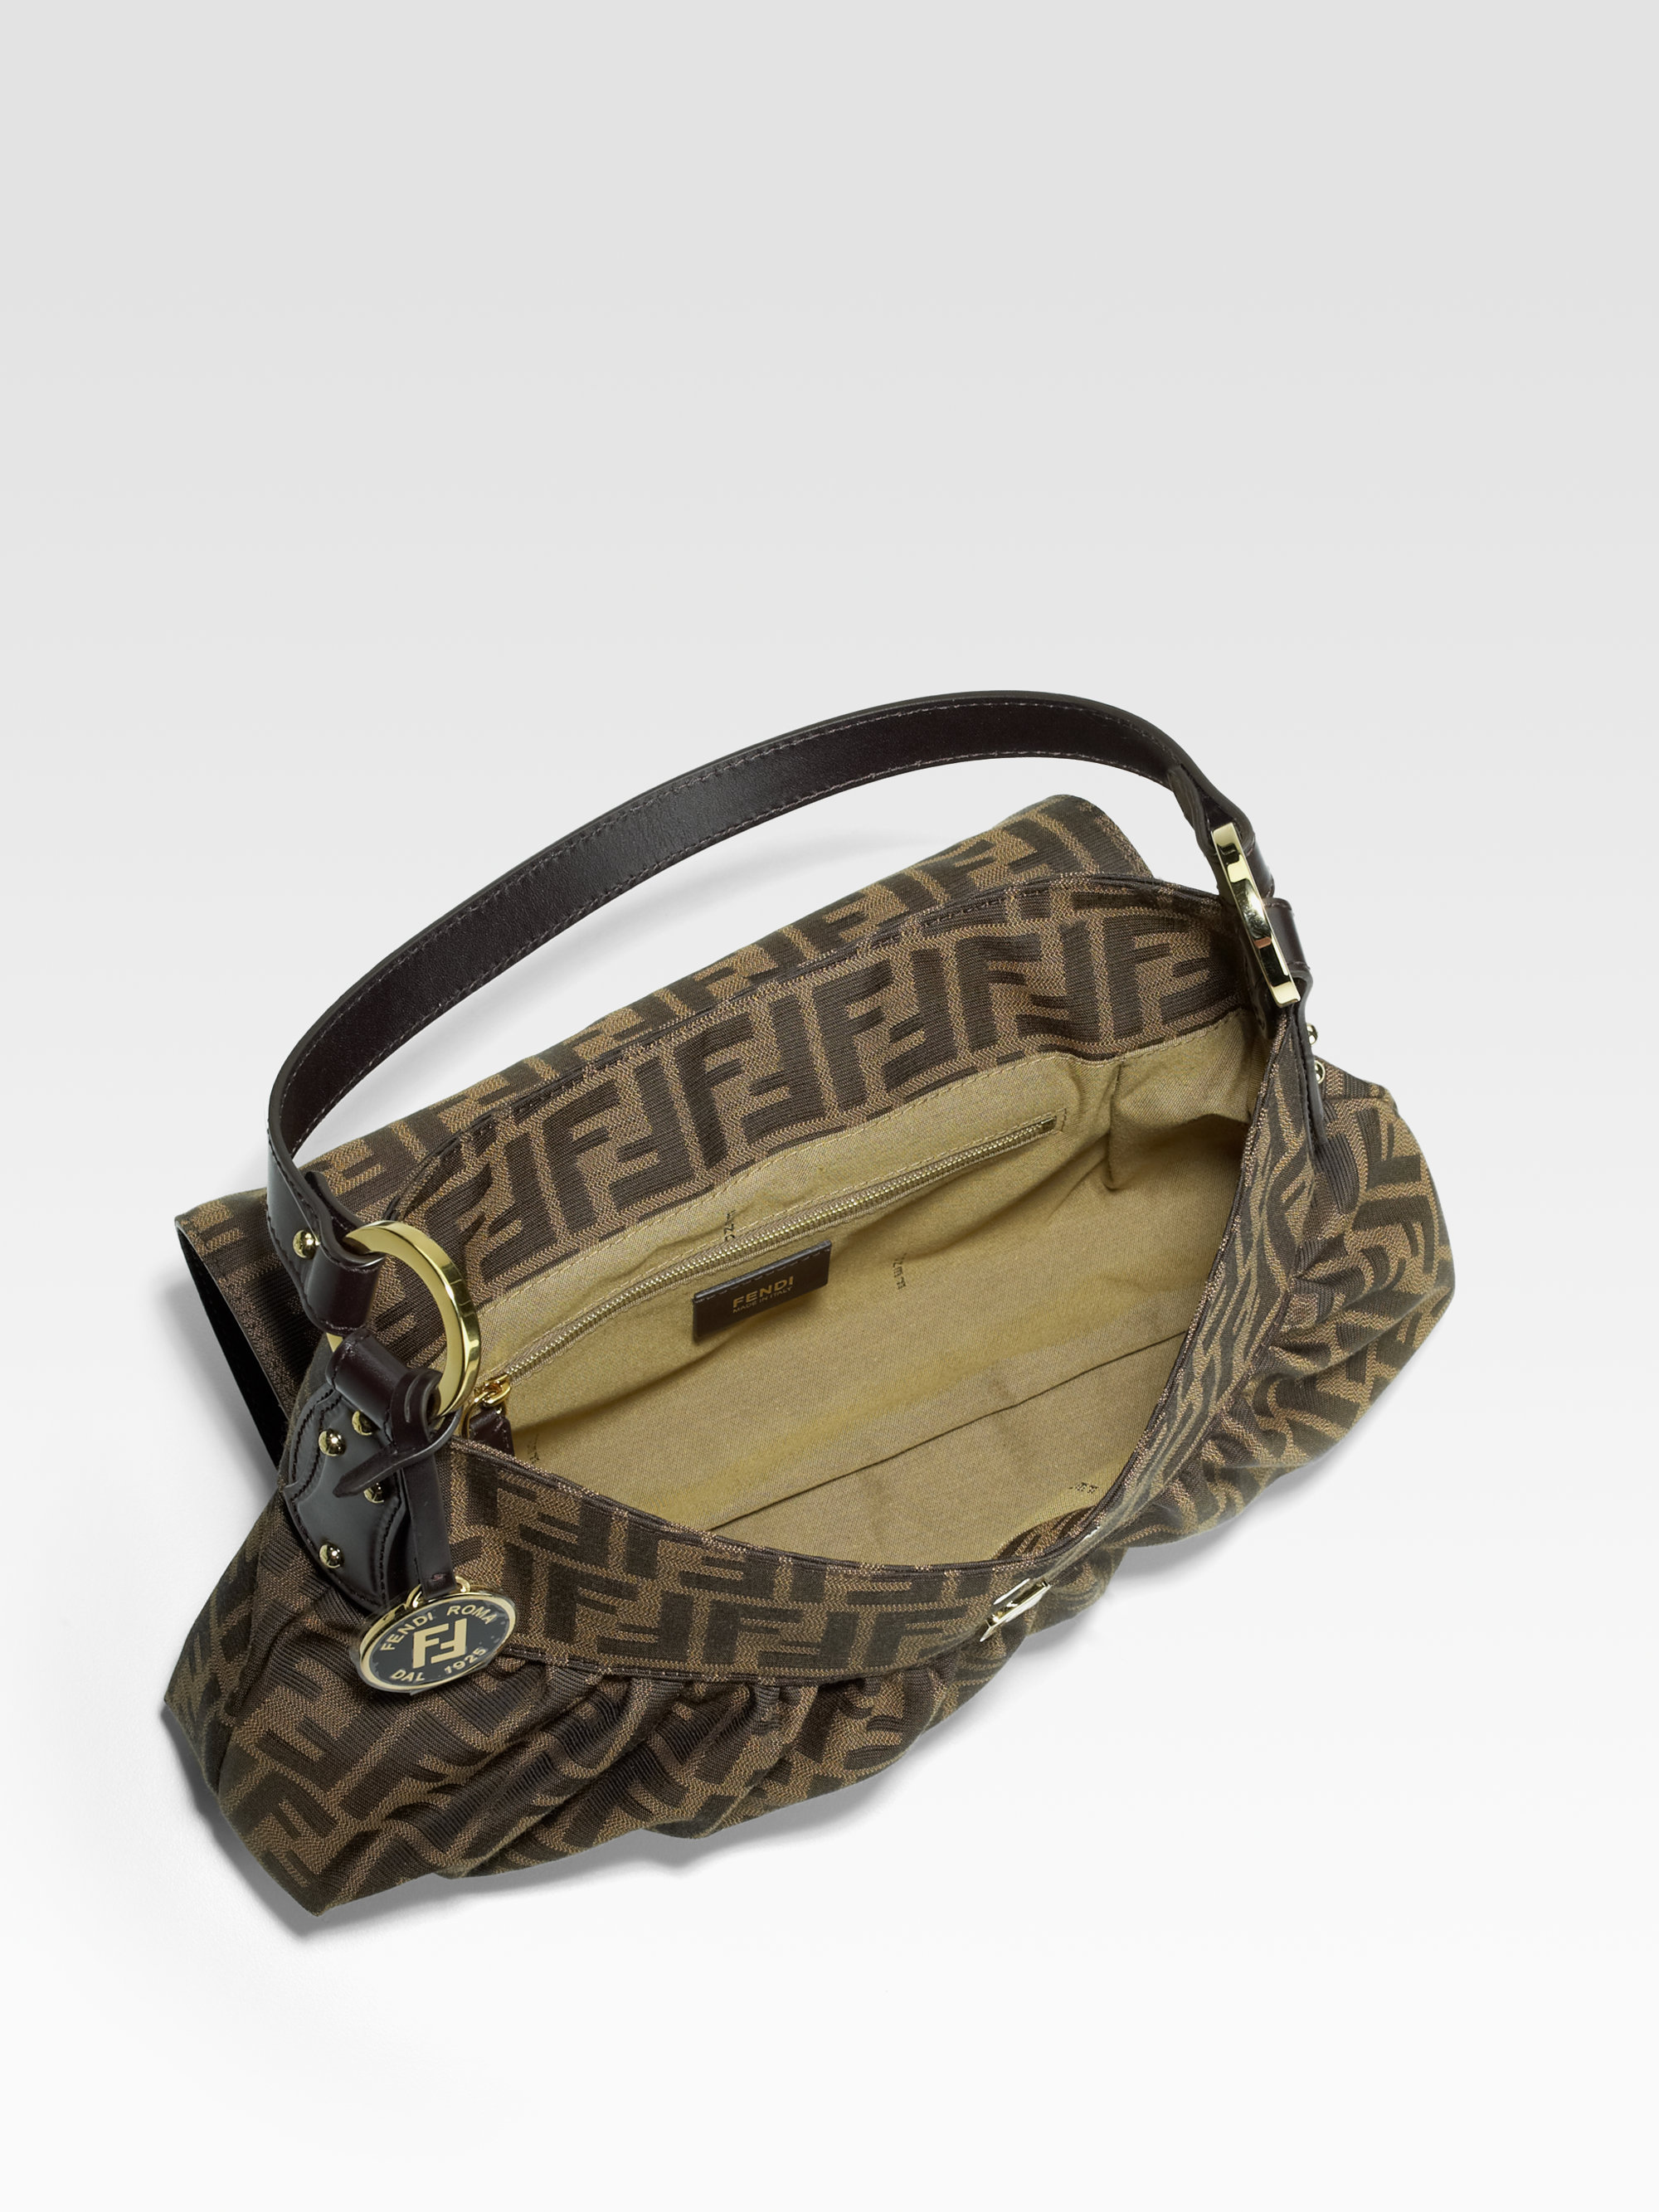 get fendi zucca chef medium shoulder bag tobacco 81189 2c852 d6b24  buy  fendi grande borsa chef jacquard bag in brown dark brown lyst 4d81b 82966 fb8342ee00bf3